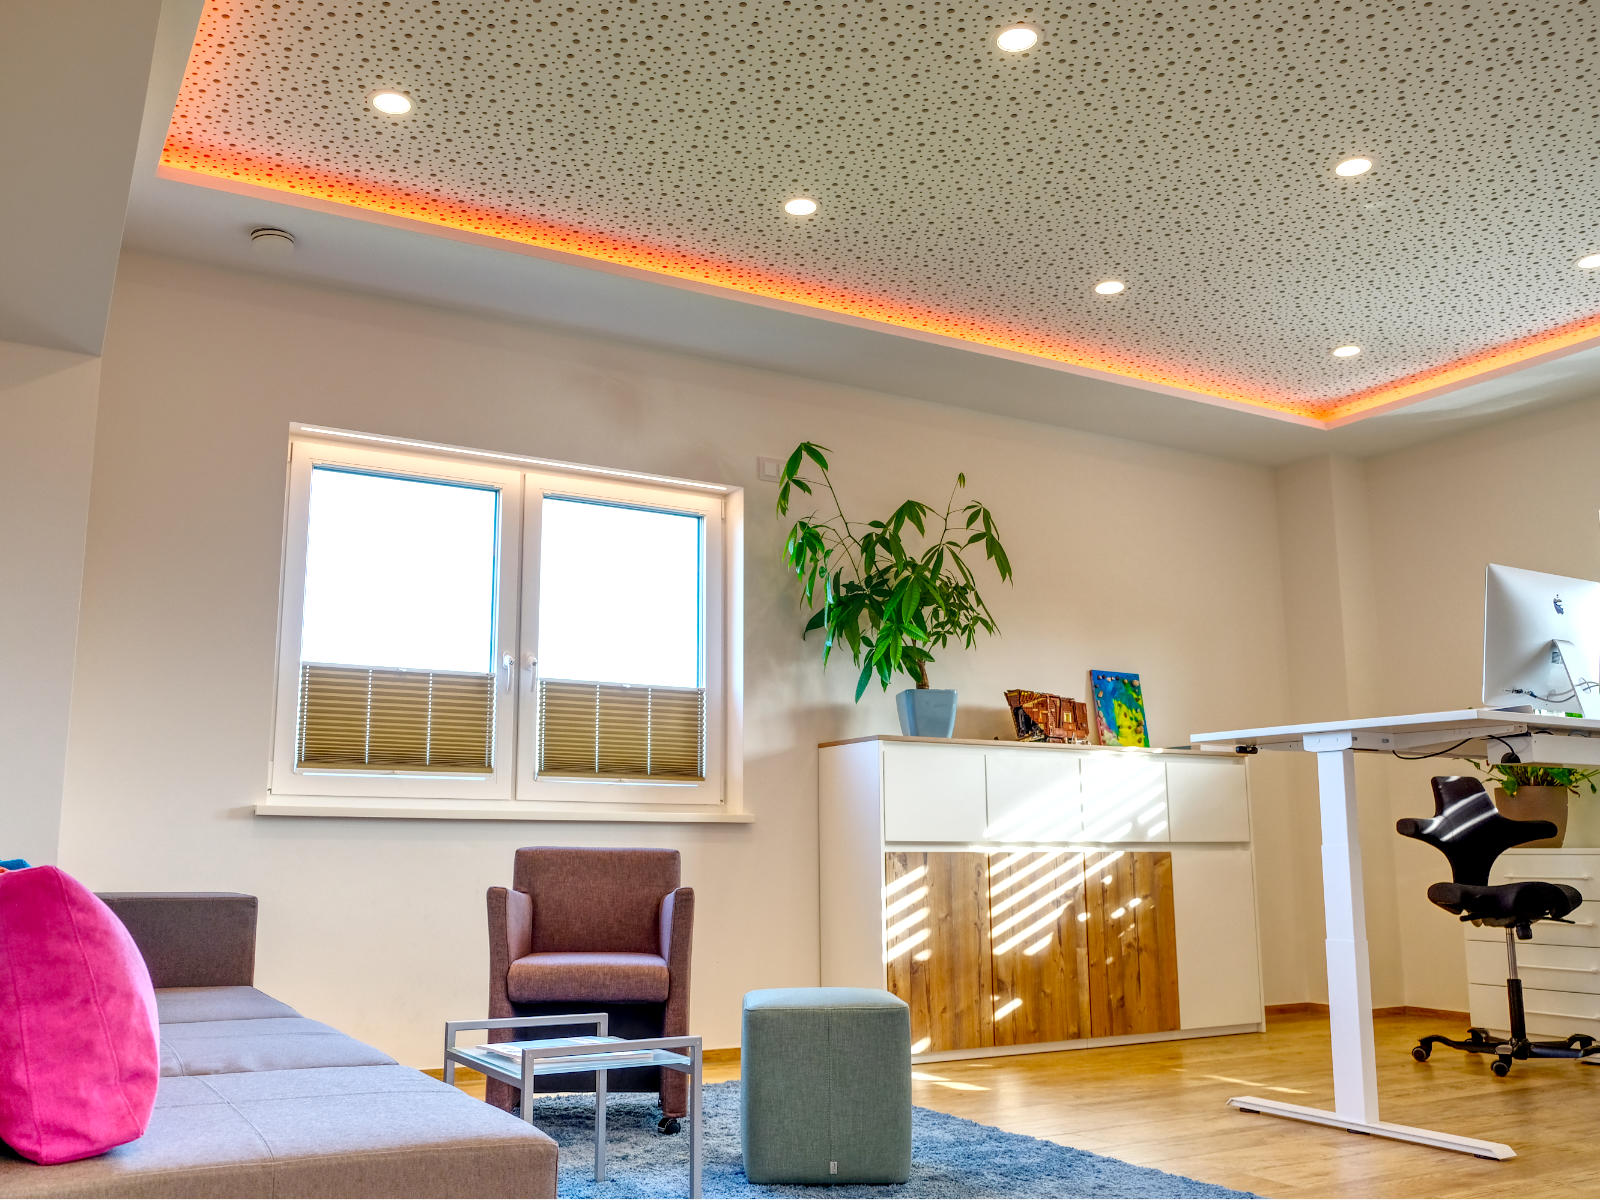 indirekte led beleuchtung und lampen im b ro. Black Bedroom Furniture Sets. Home Design Ideas